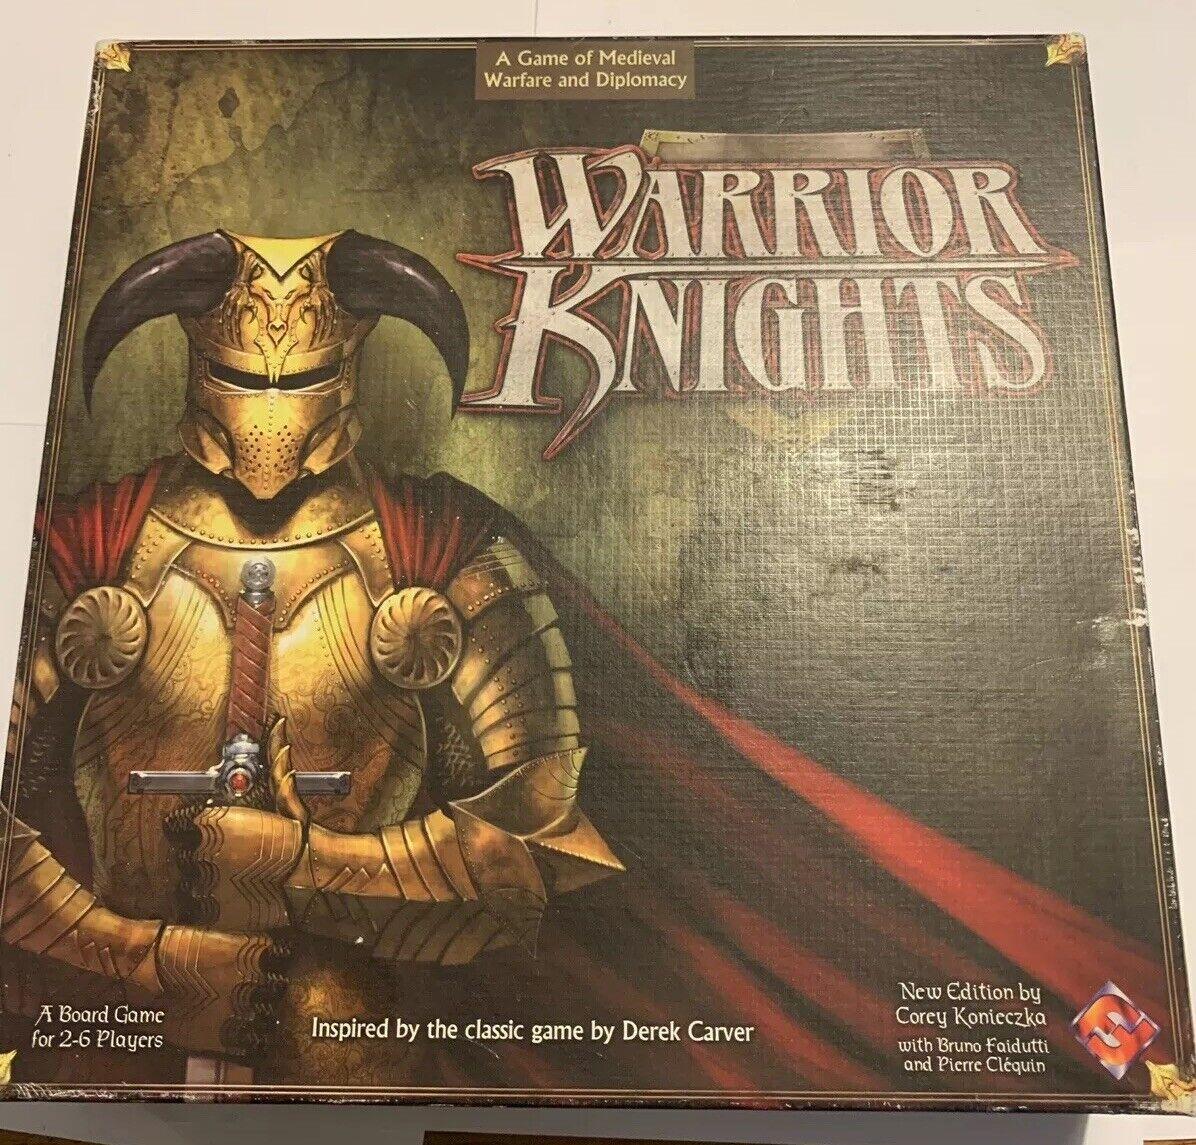 risparmiare sulla liquidazione Warrior Knights tavola gioco fantasyc volo giocos completare completare completare  buona reputazione